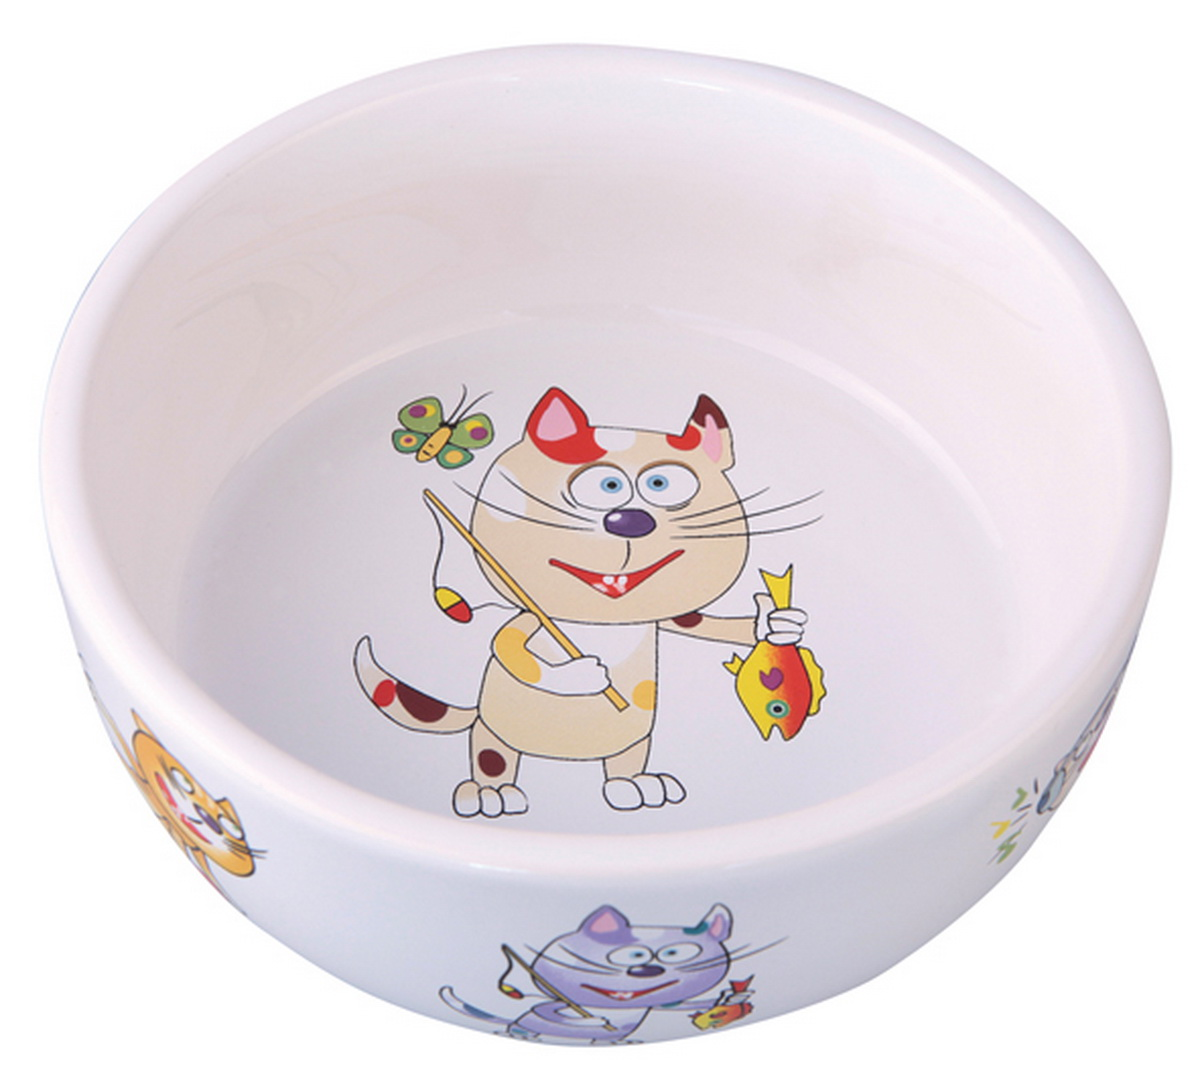 Миска для кошек Dezzie Улов, 300 мл миска на подставке для кошек dezzie дуга